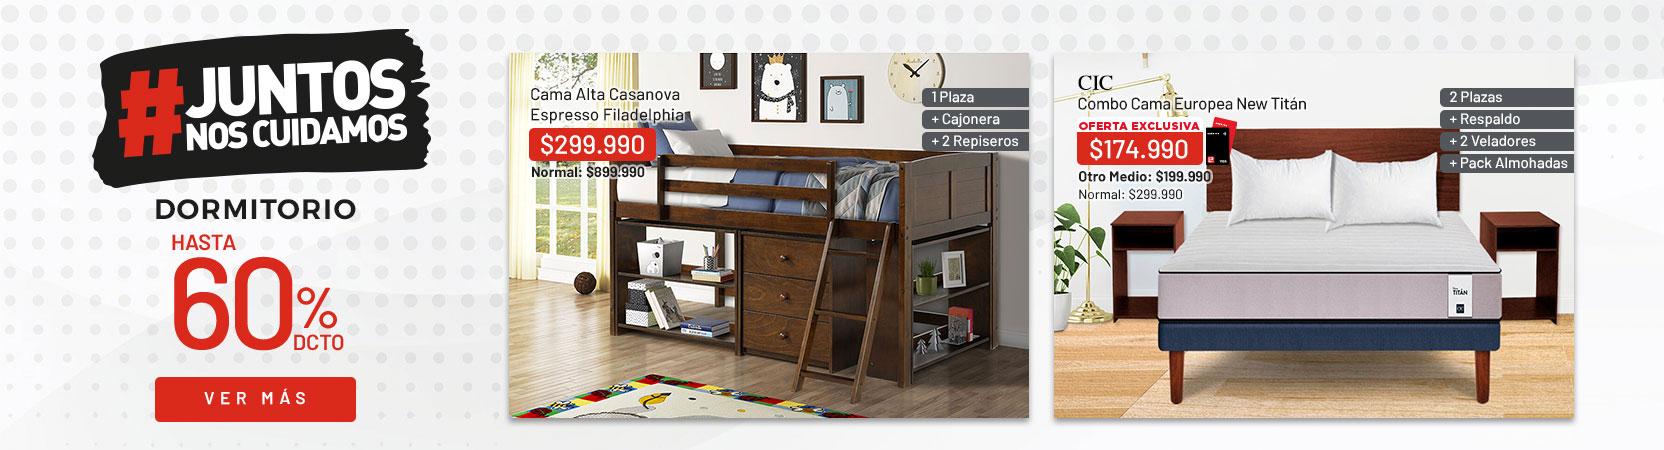 Dormitorio Hasta 60% dcto - Despacho express productos seleccionados